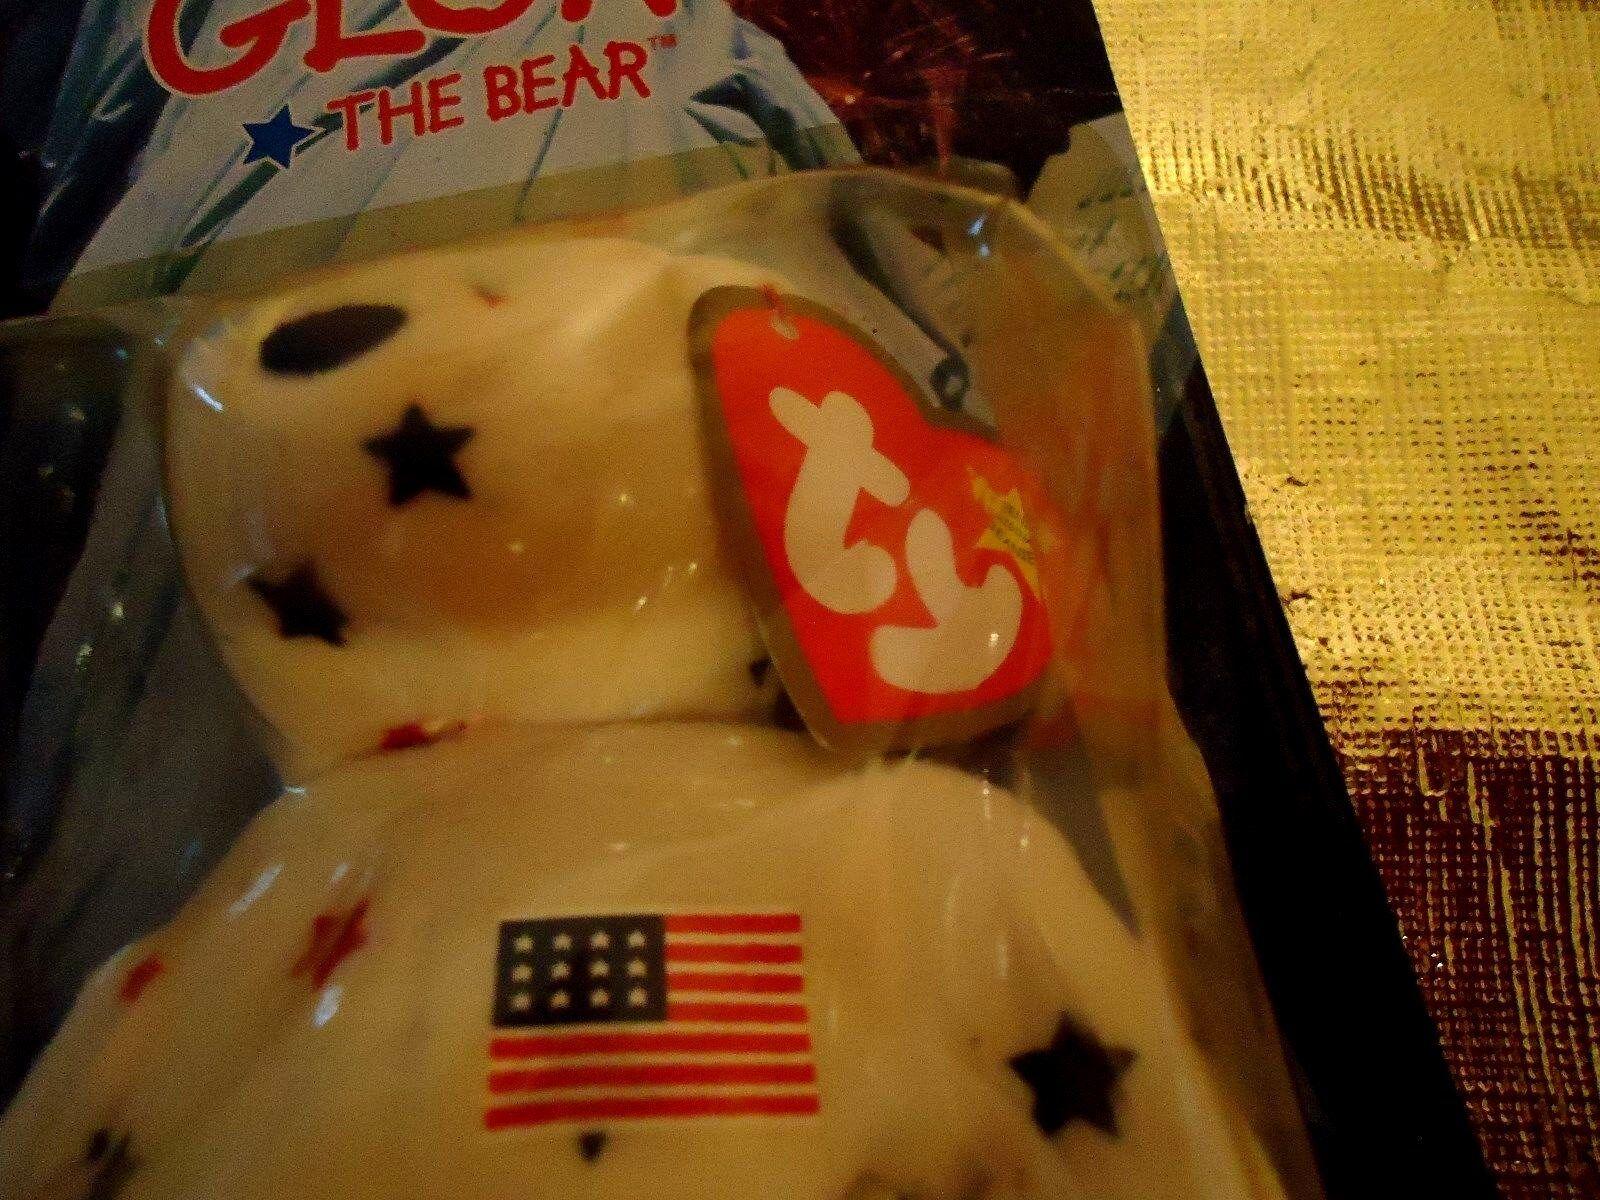 1999 ty ty ty glory the bear RARE ERRROR TAG 1993 OAKBROOK IN ORGINAL BOX MINT CONDITI 3b4ec1